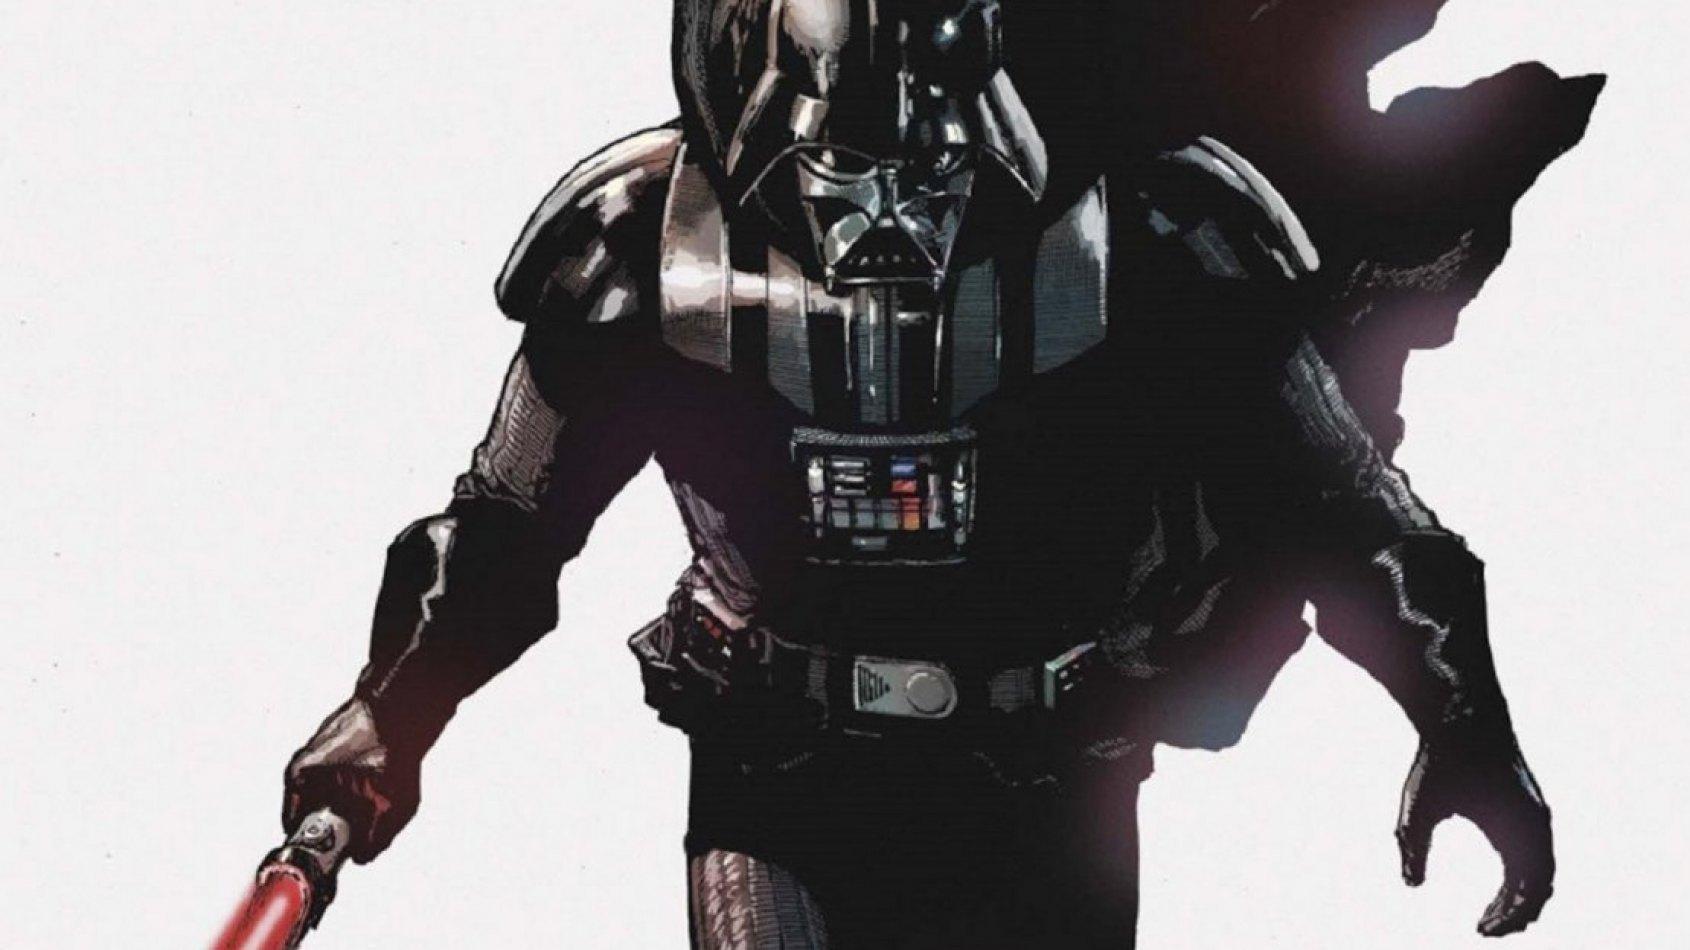 [Panini] Sortie du Star Wars Hors Série #1